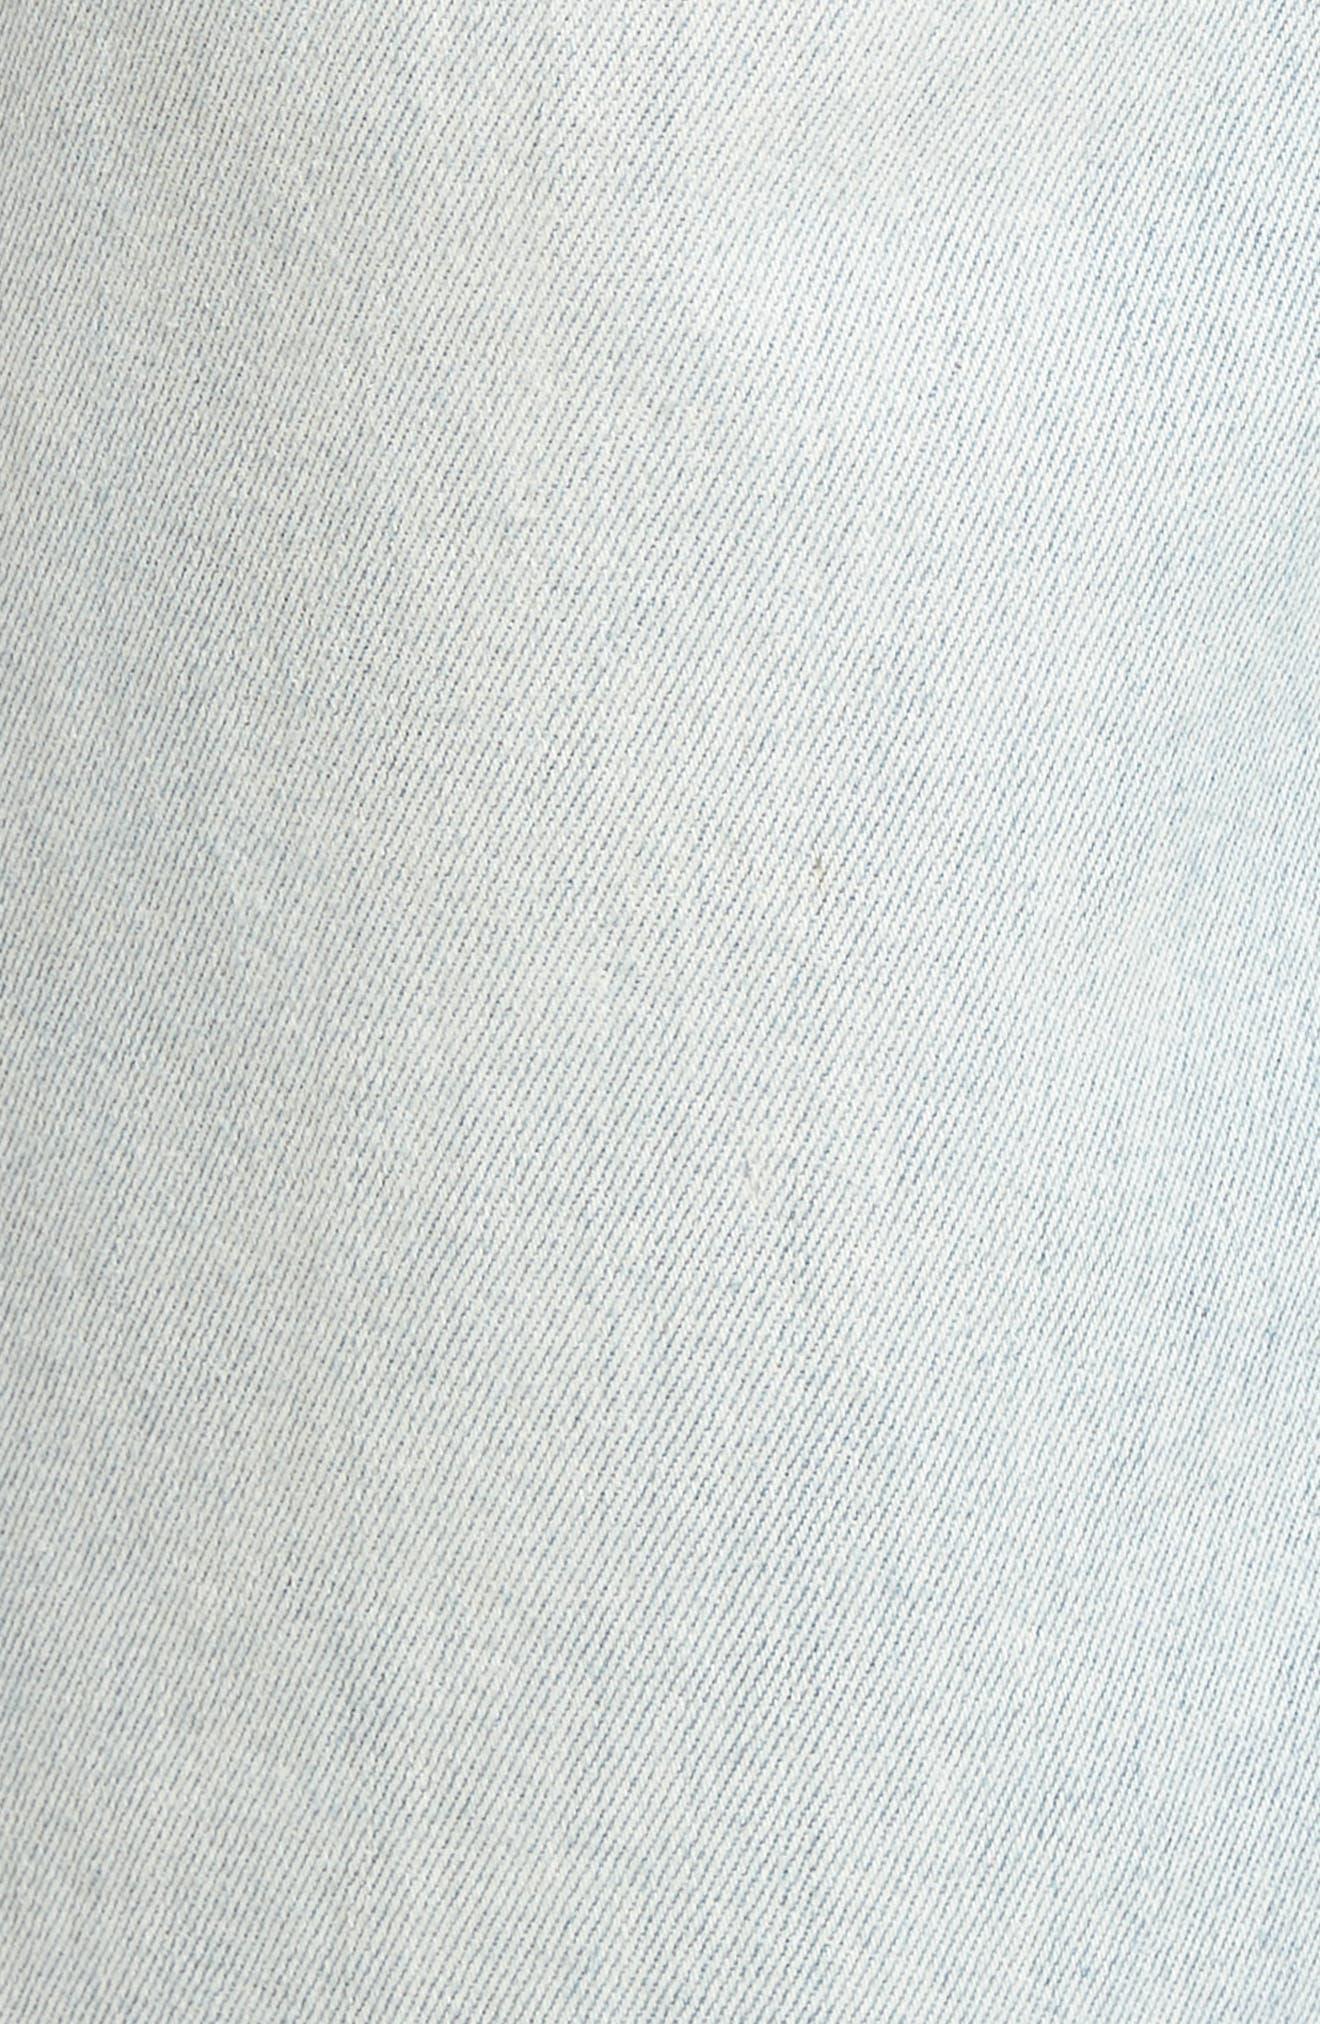 Holly High Waist Released Hem Crop Wide Leg Jeans,                             Alternate thumbnail 6, color,                             Frame Of Mind